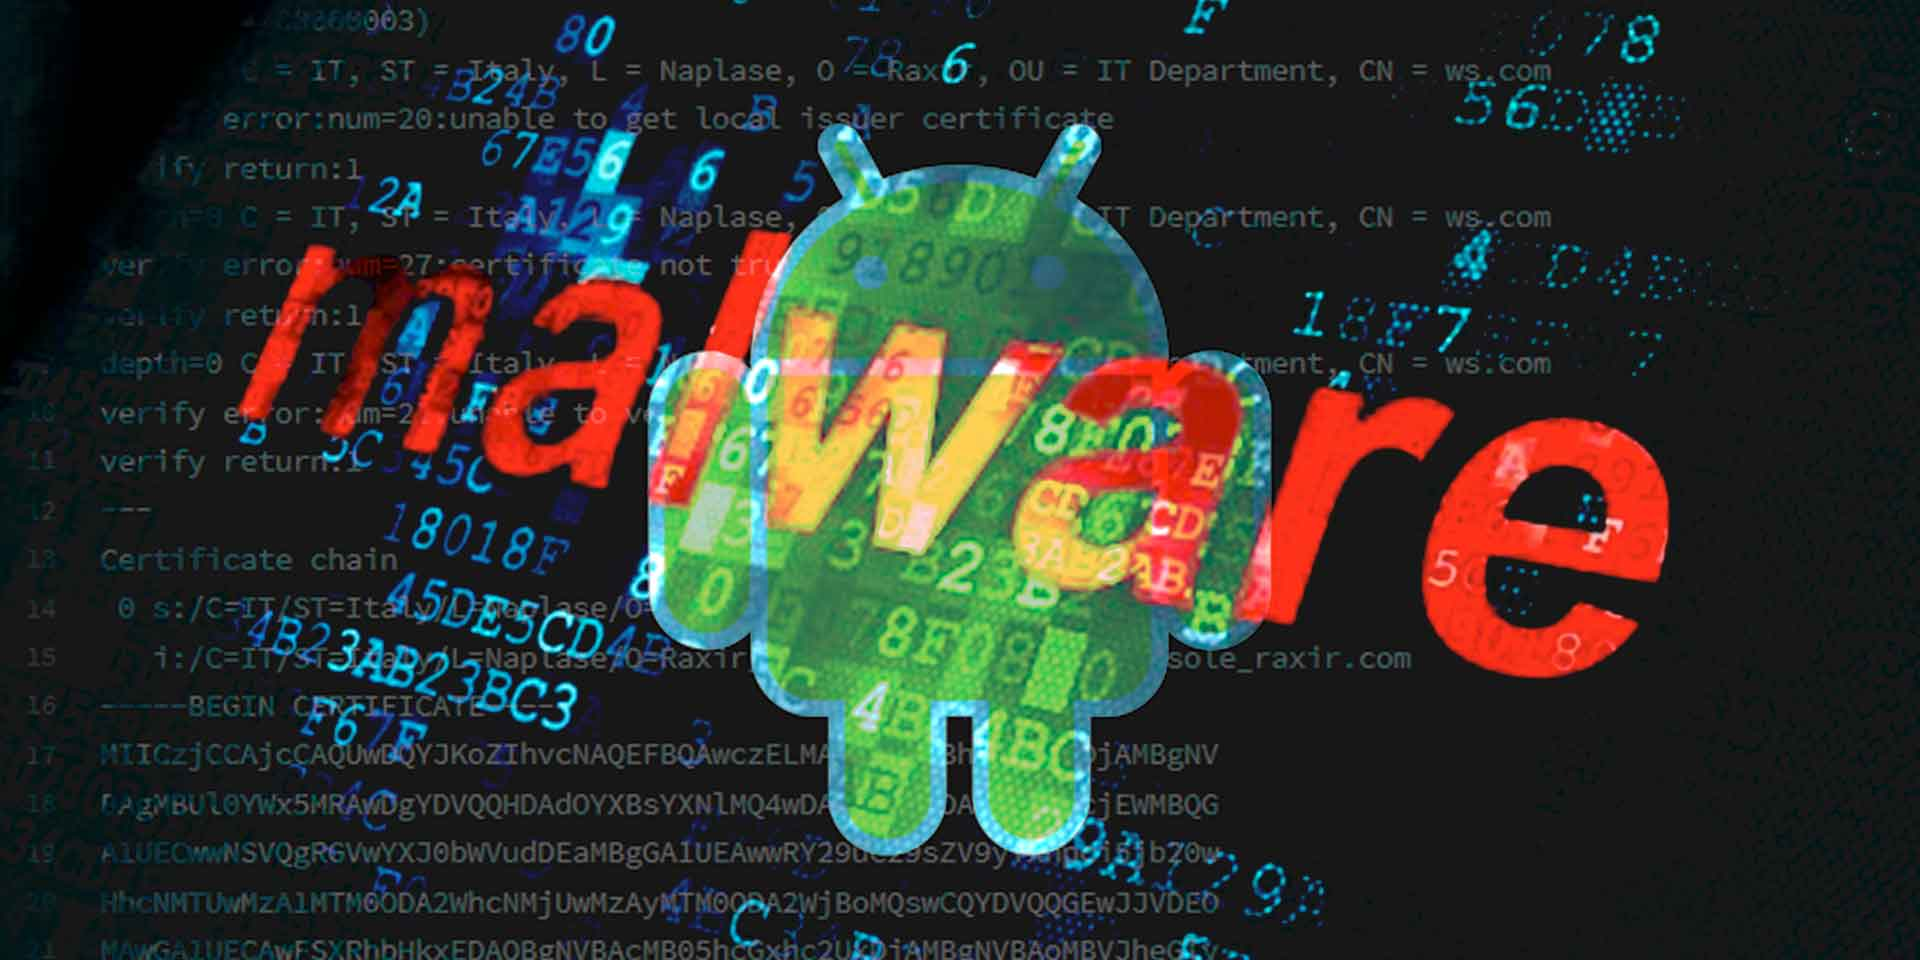 Canale Sicurezza - Judy Malware